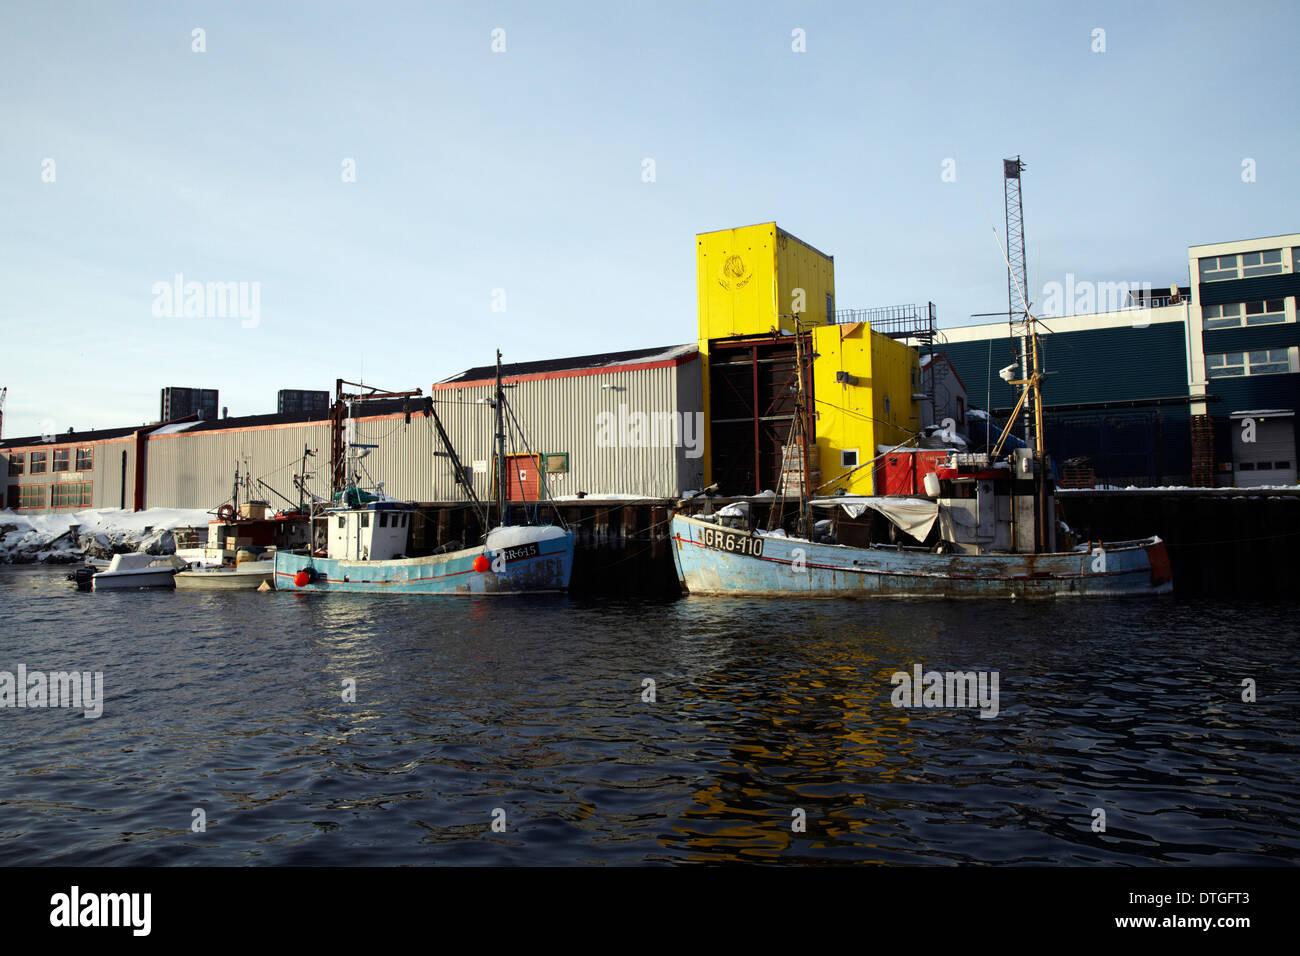 Fishing boats at the harbor of Nuuk city, Greenland - Stock Image